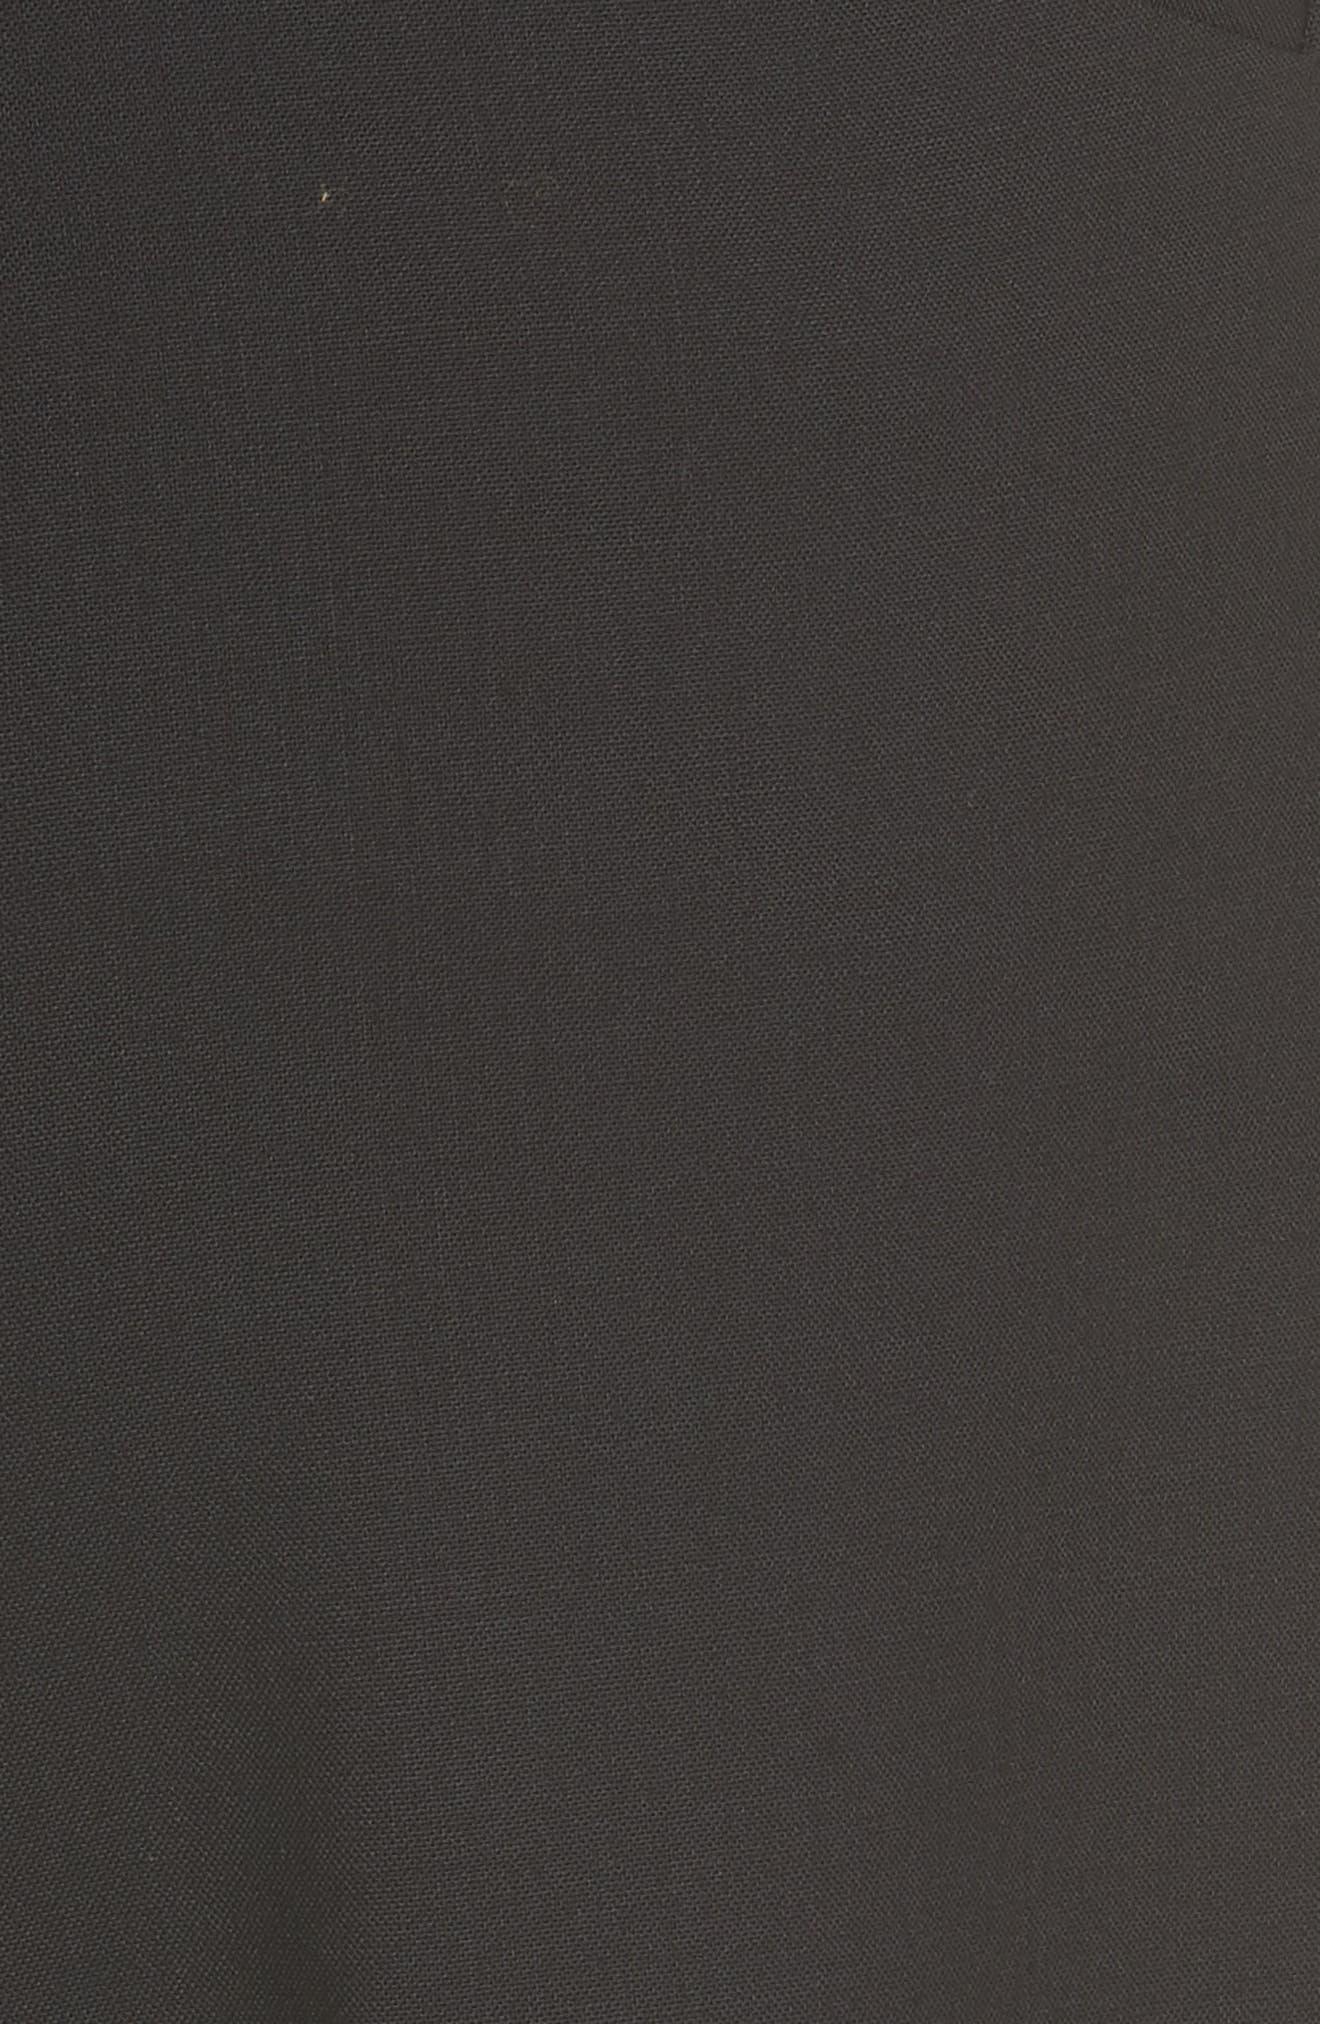 Demitria 2 Stretch Wool Suit Pants,                             Alternate thumbnail 5, color,                             Black